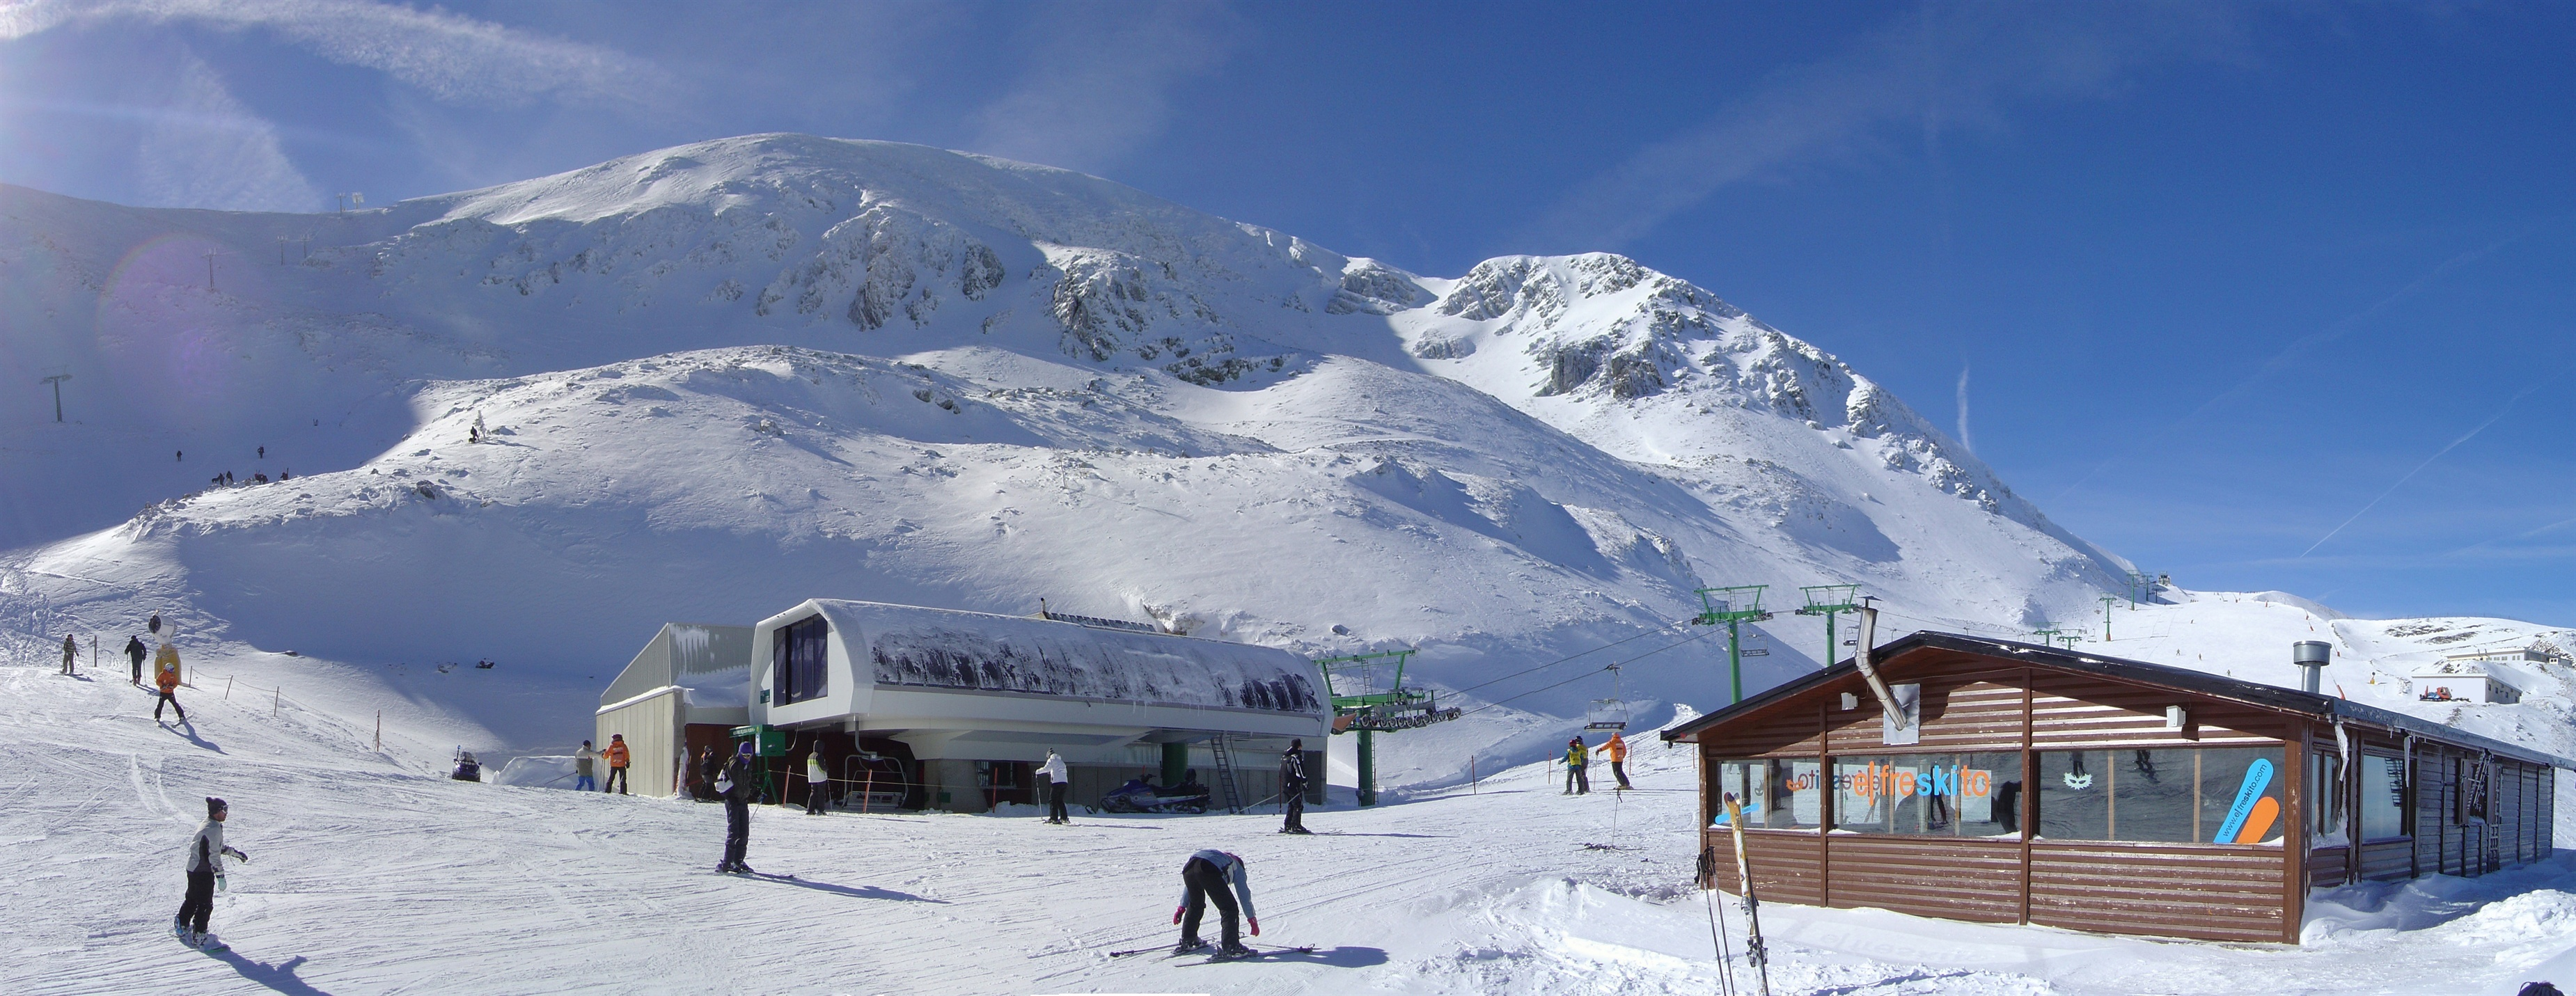 Valdezcaray prevé abrir este jueves diecisiete pistas de esquí en 13,3 kilómetros esquiables